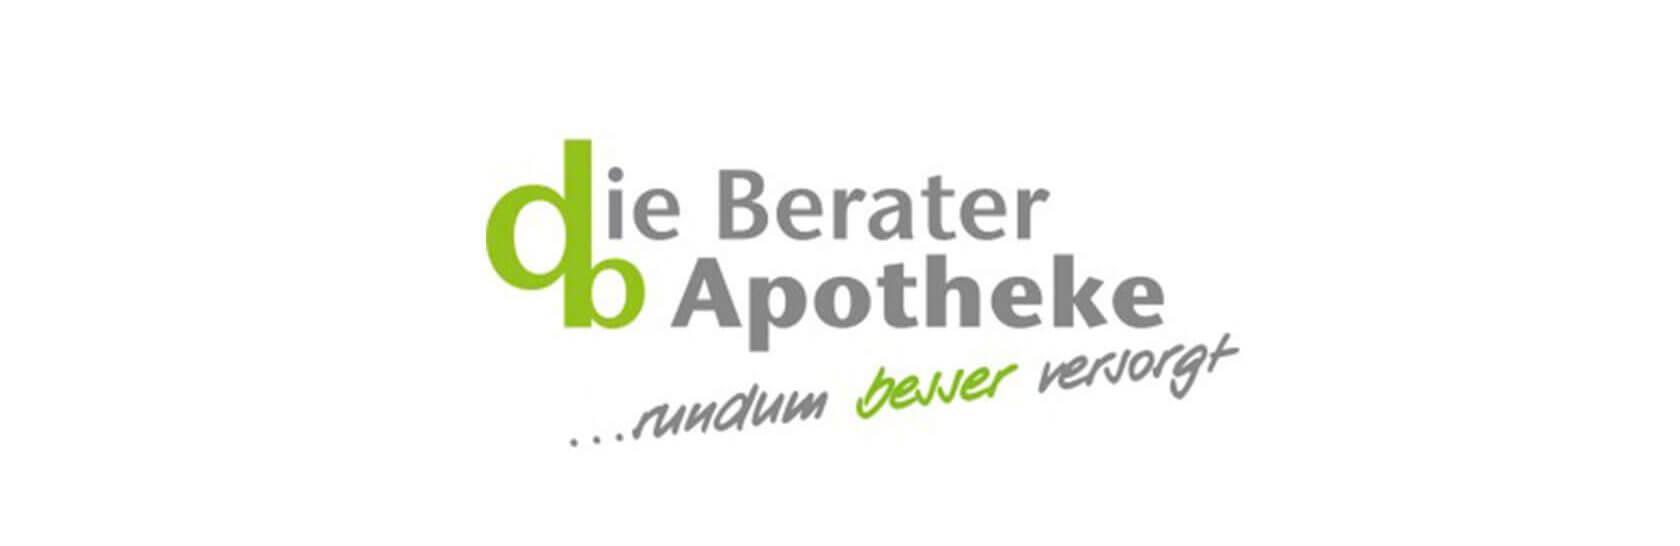 smart cap for insulin pens berater apotheke dukada Germany